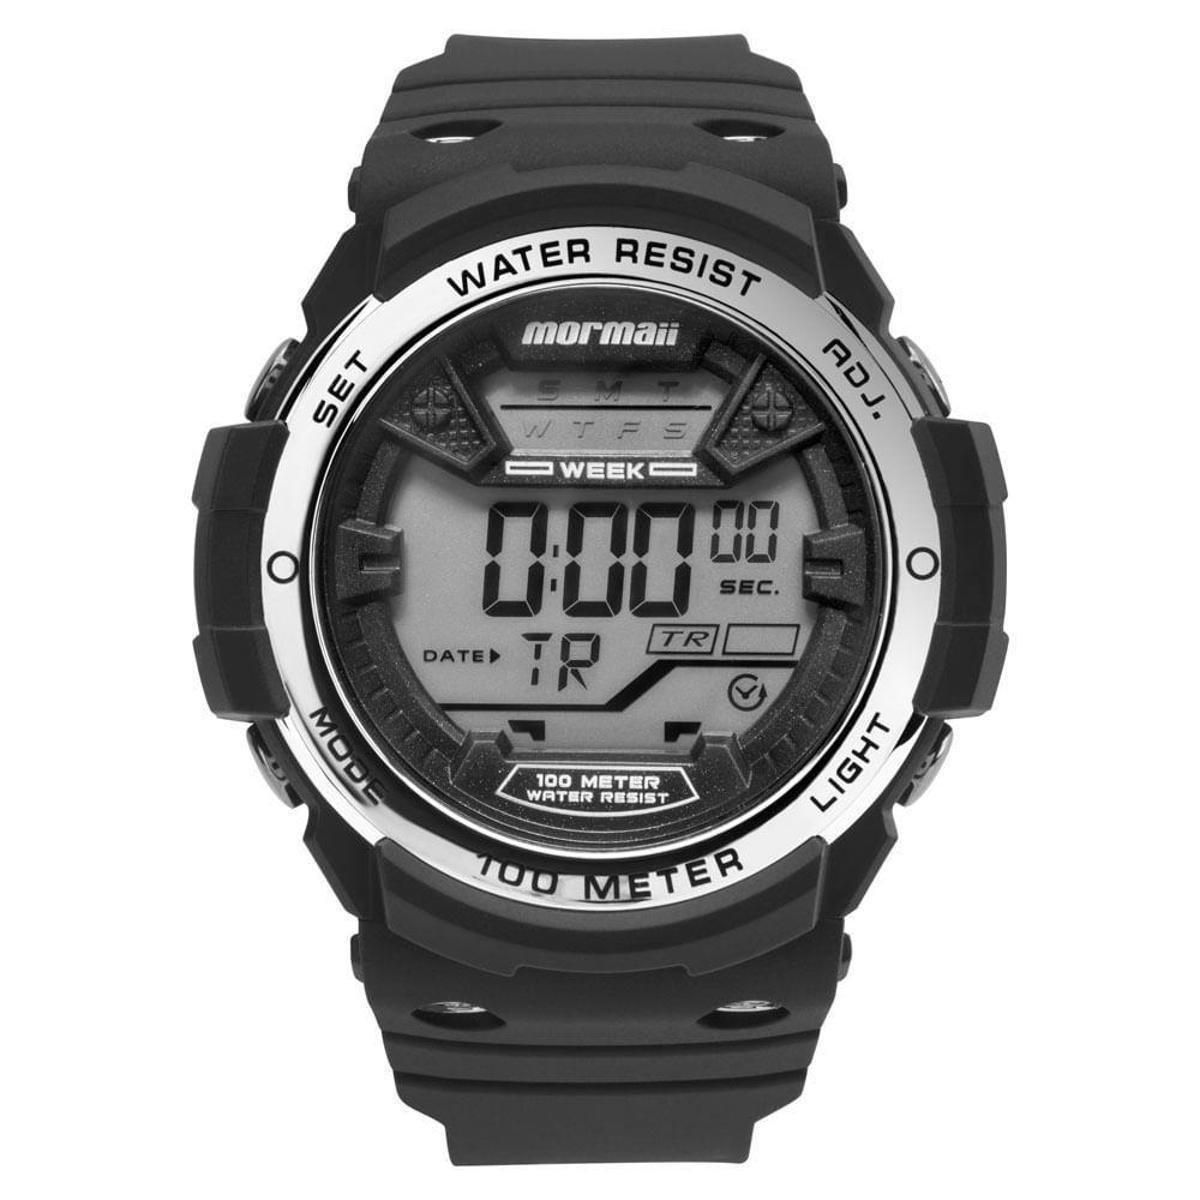 2b705f7357c Relógio Mormaii Masculino Wave - MO3500B 8K MO3500B 8K - Preto - Compre  Agora